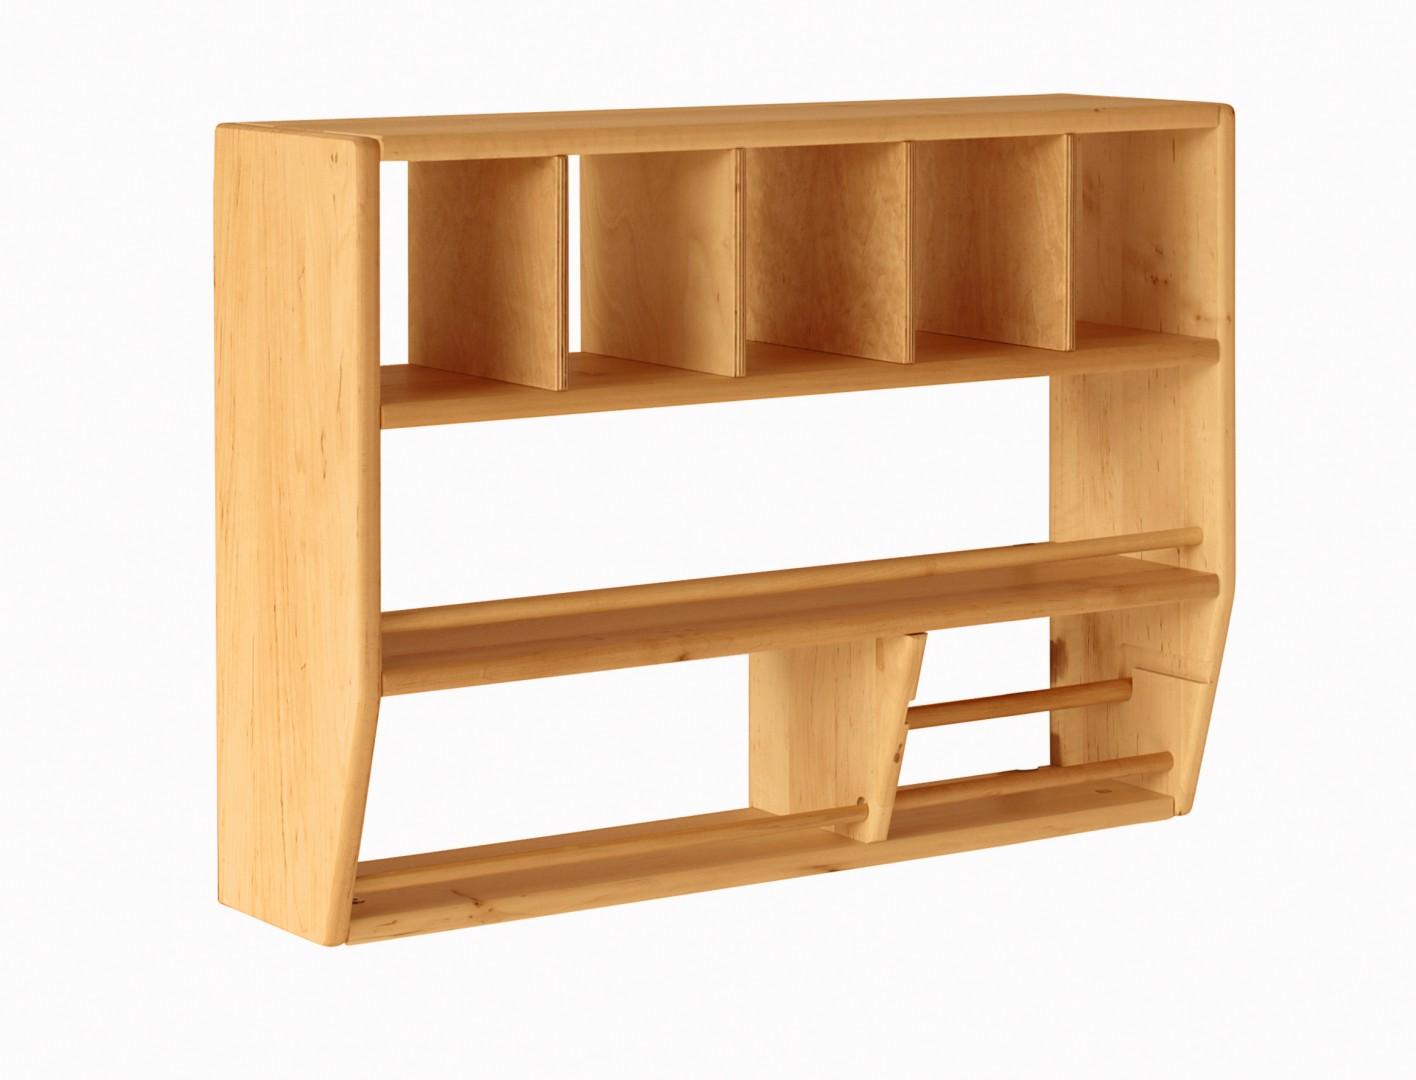 biokinder robin wickelregal h ngeregal. Black Bedroom Furniture Sets. Home Design Ideas